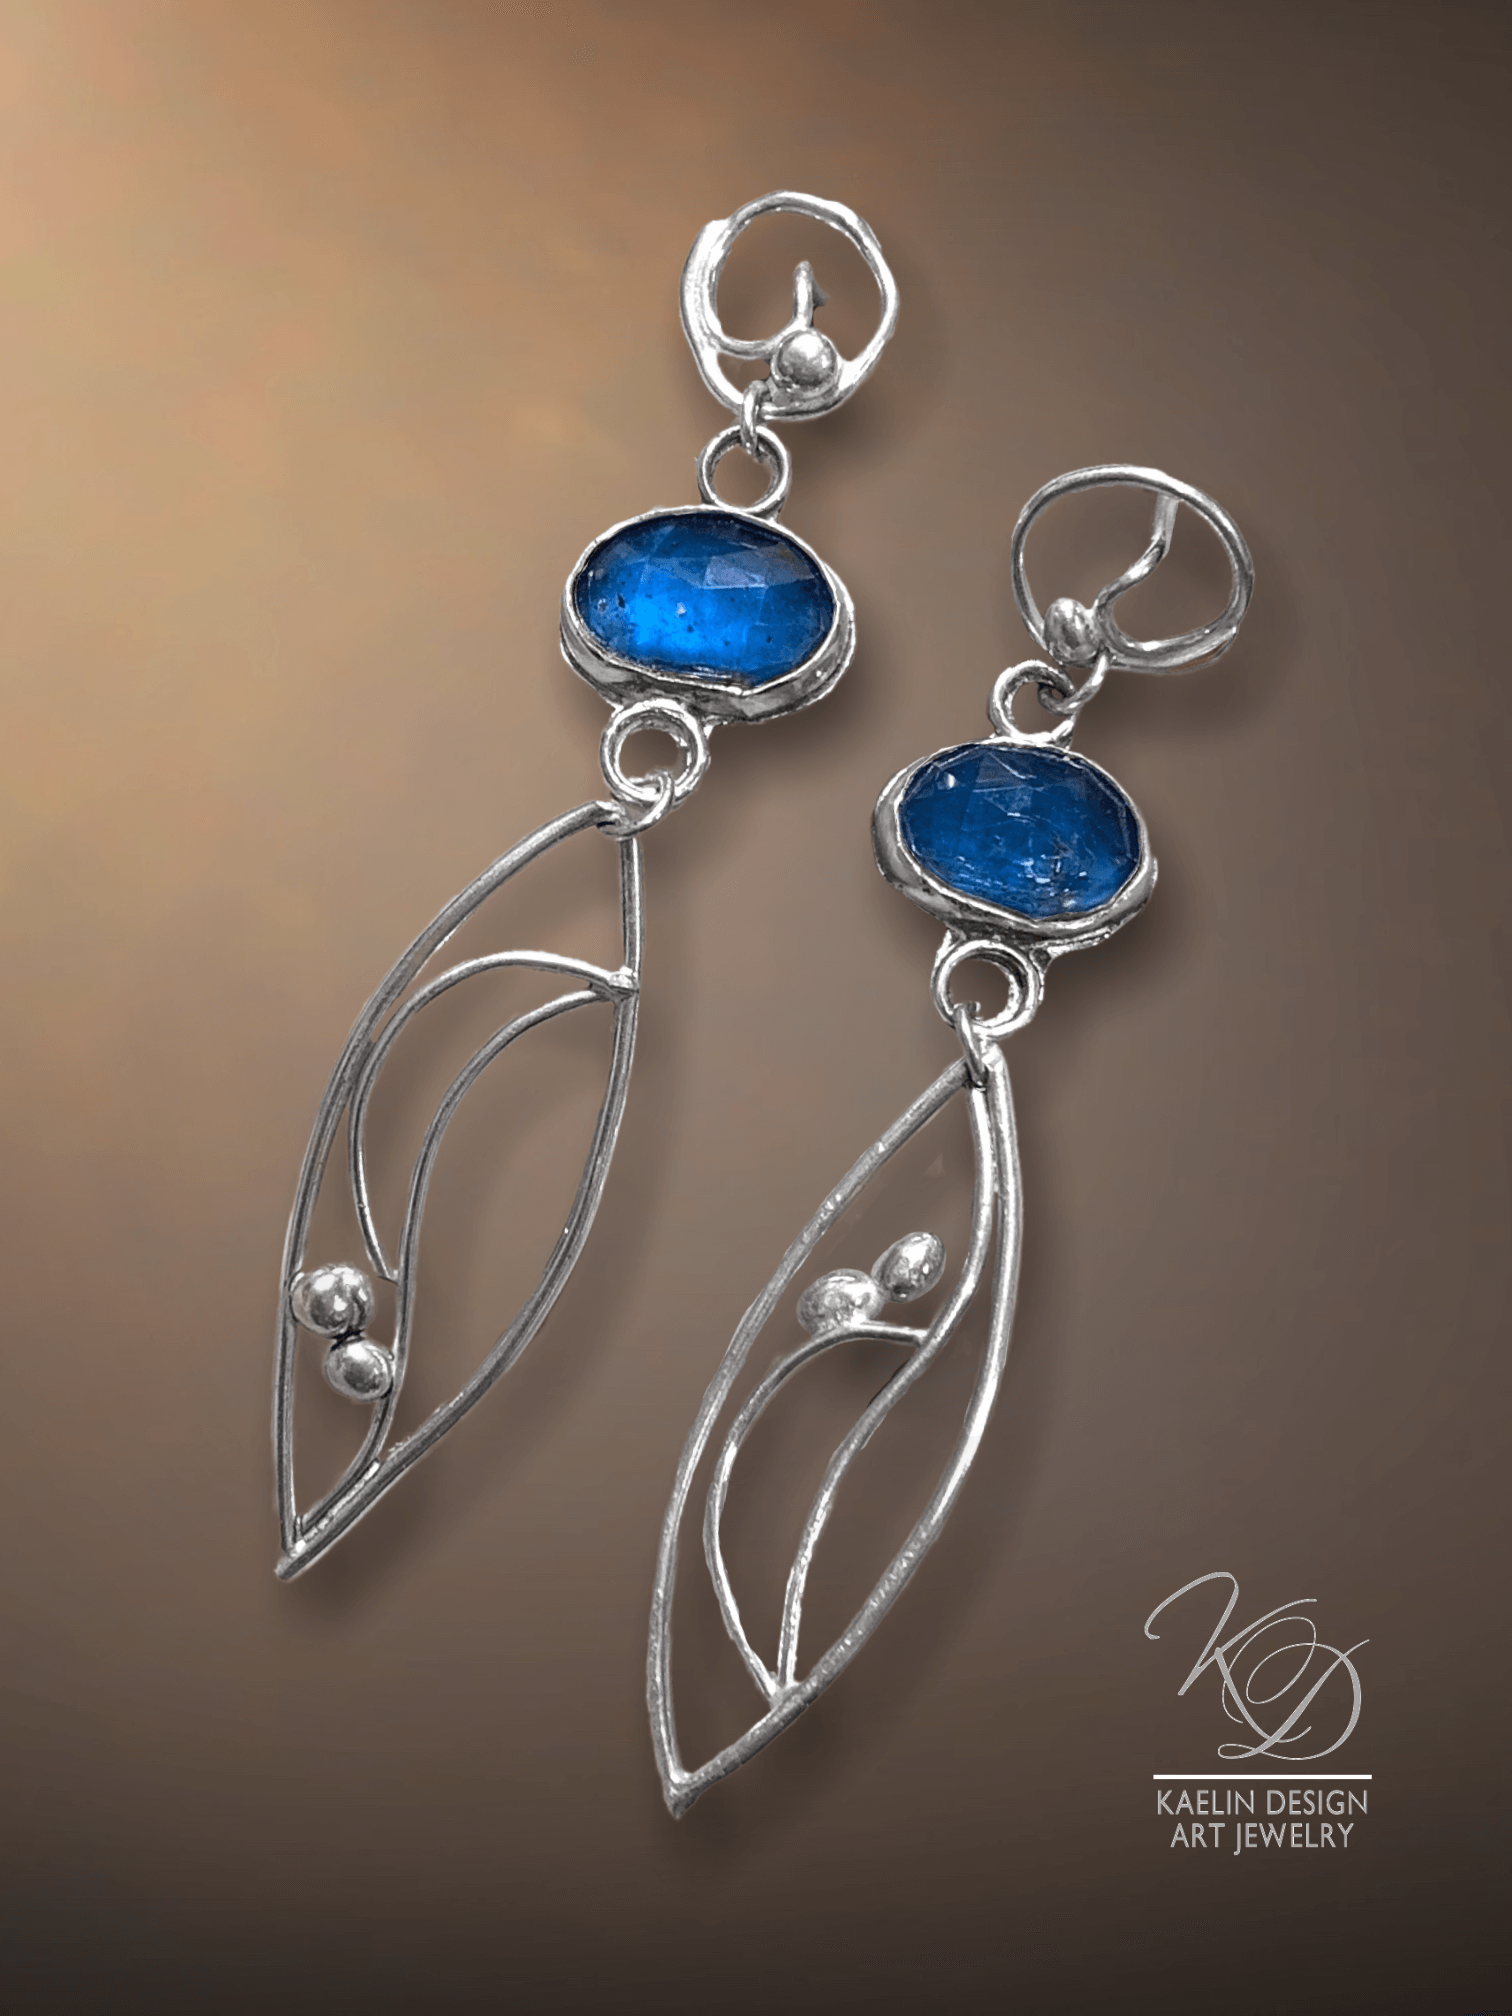 Tidal Whispers Blue Kyanite Ocean Inspired Earrings by Kaelin Design Fine Art Jewelry